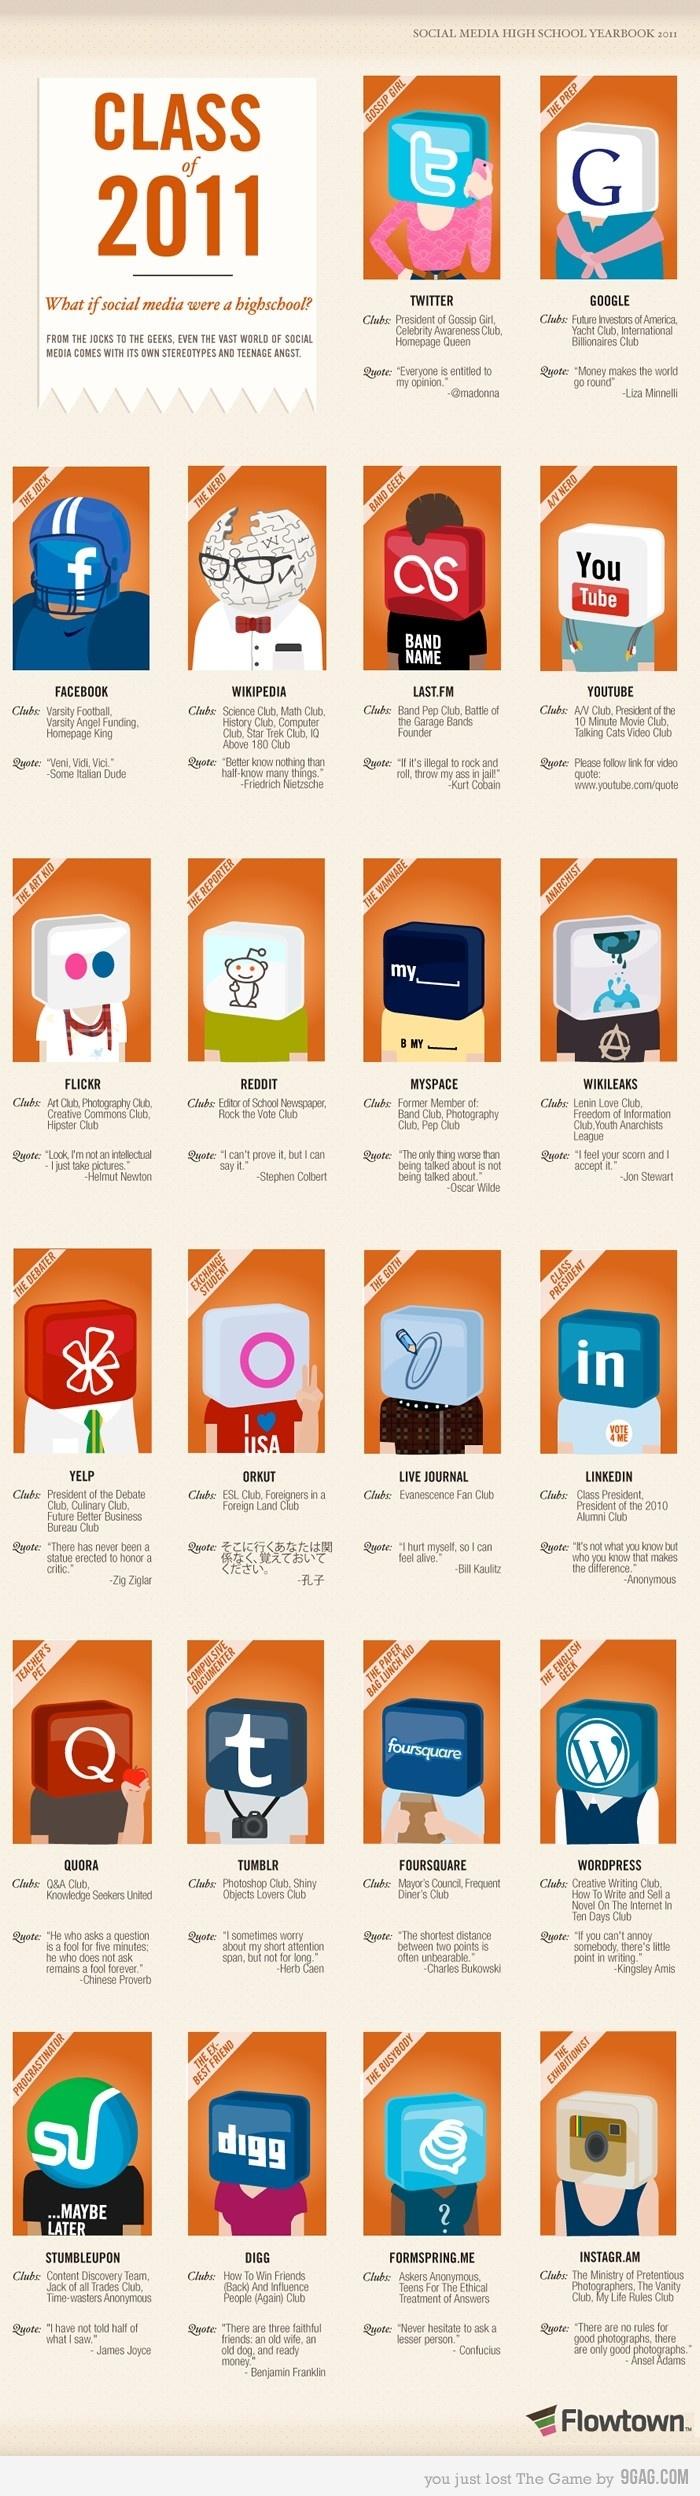 social media as students